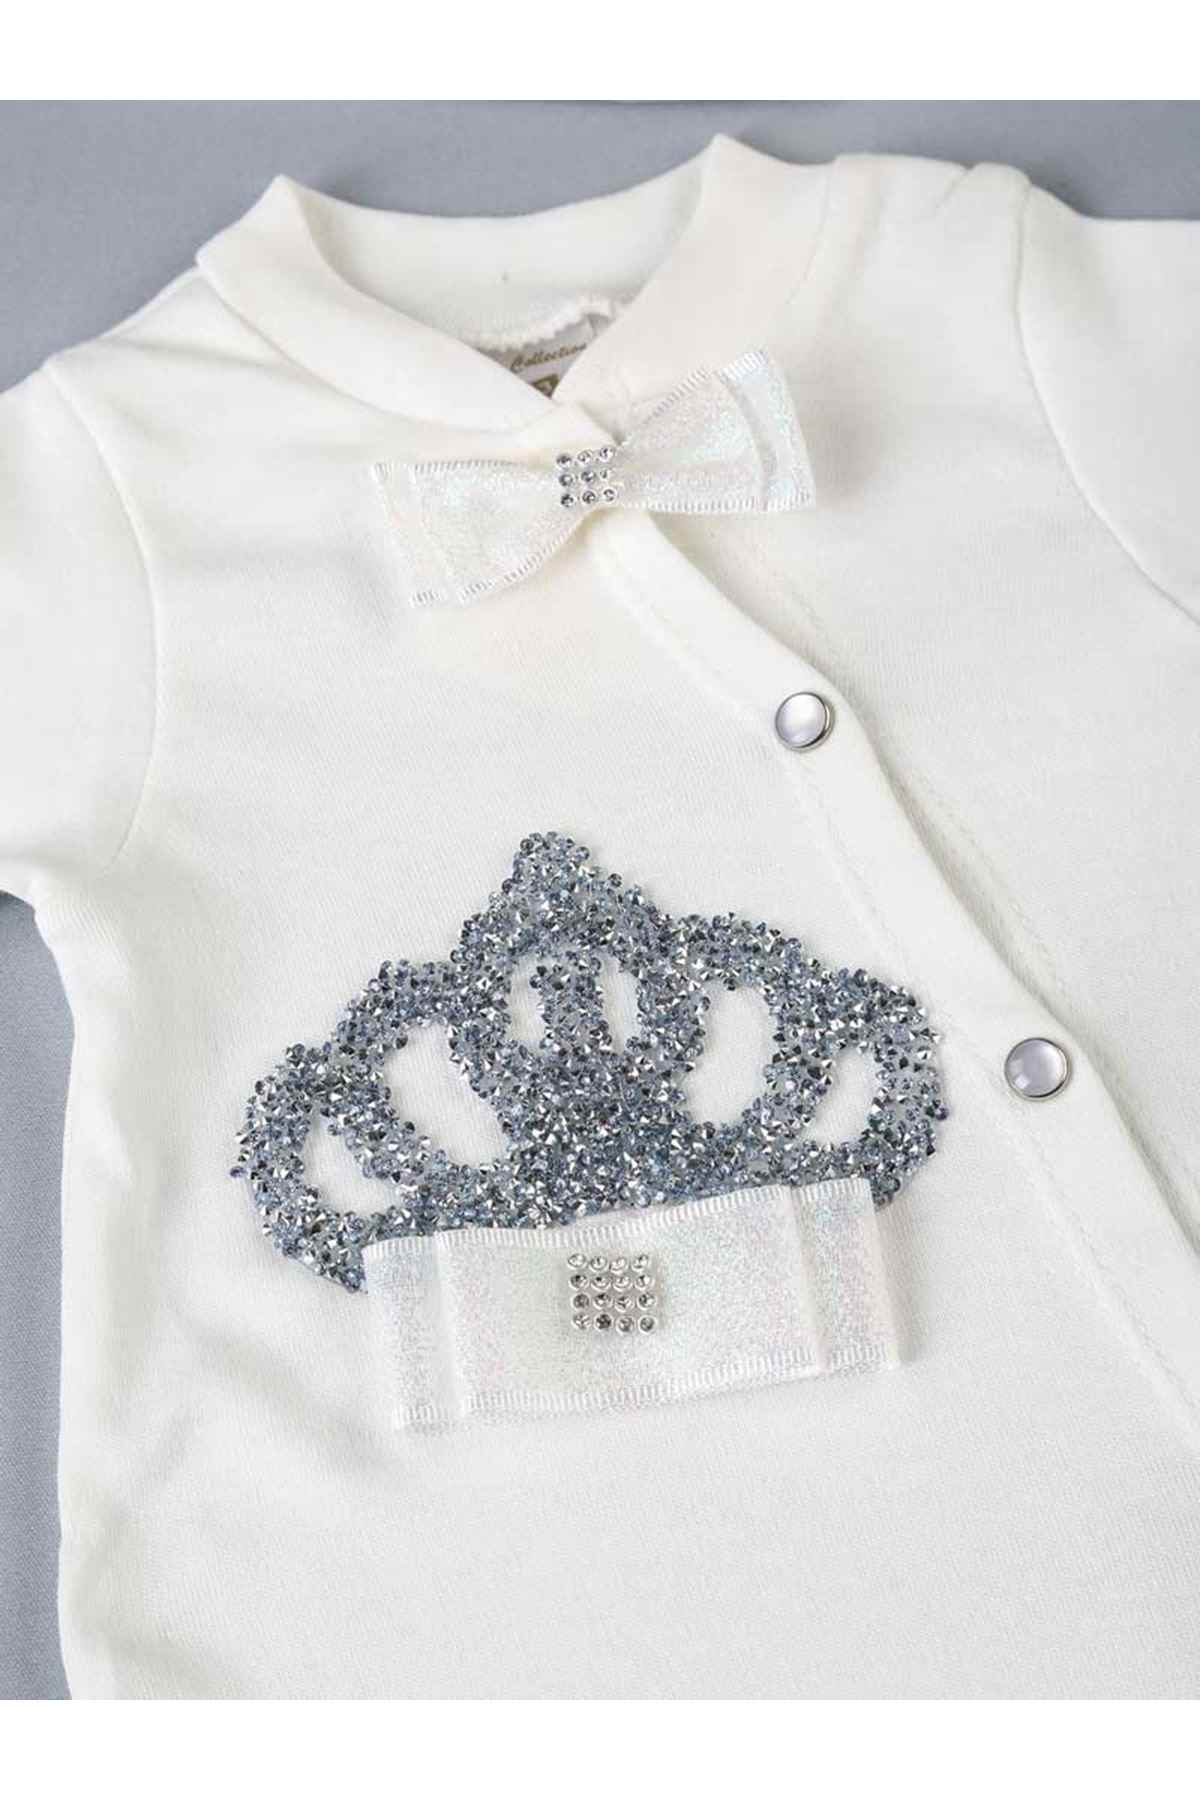 Weiße Königin Gekrönt 3 PCs Mädchen Baby Overall